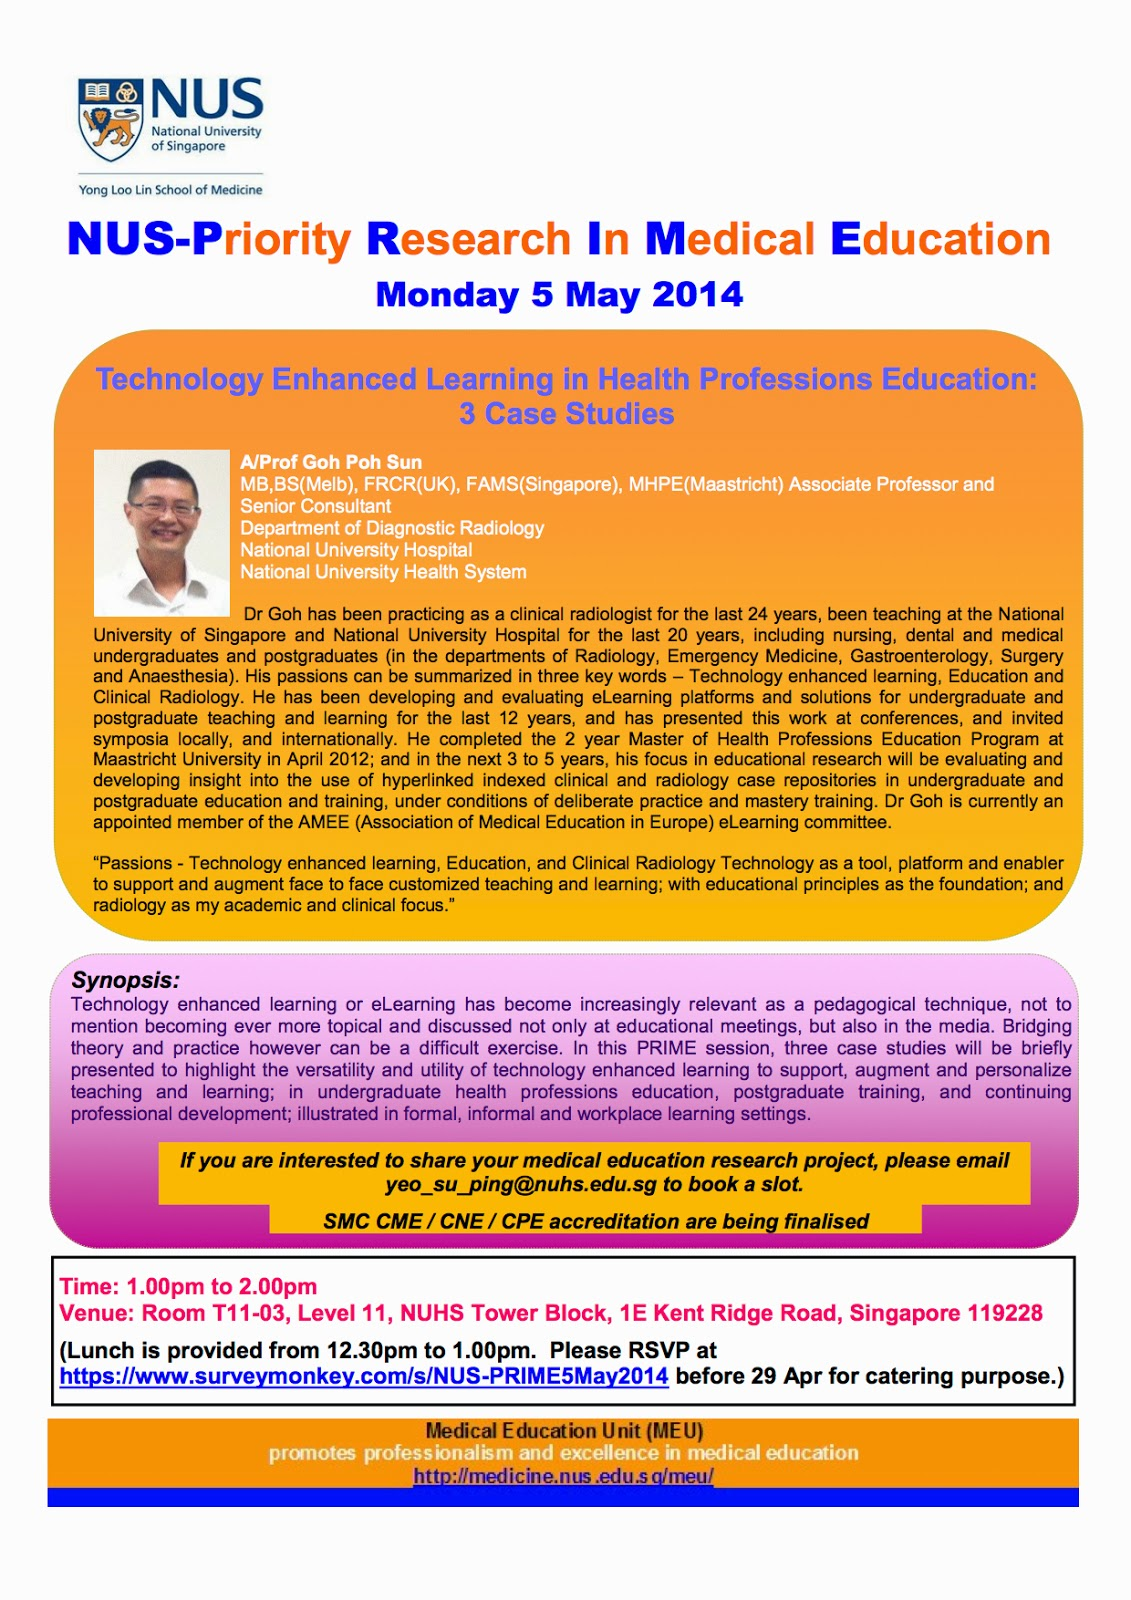 Medical Education and eLearning Portfolio: NUS-Prime